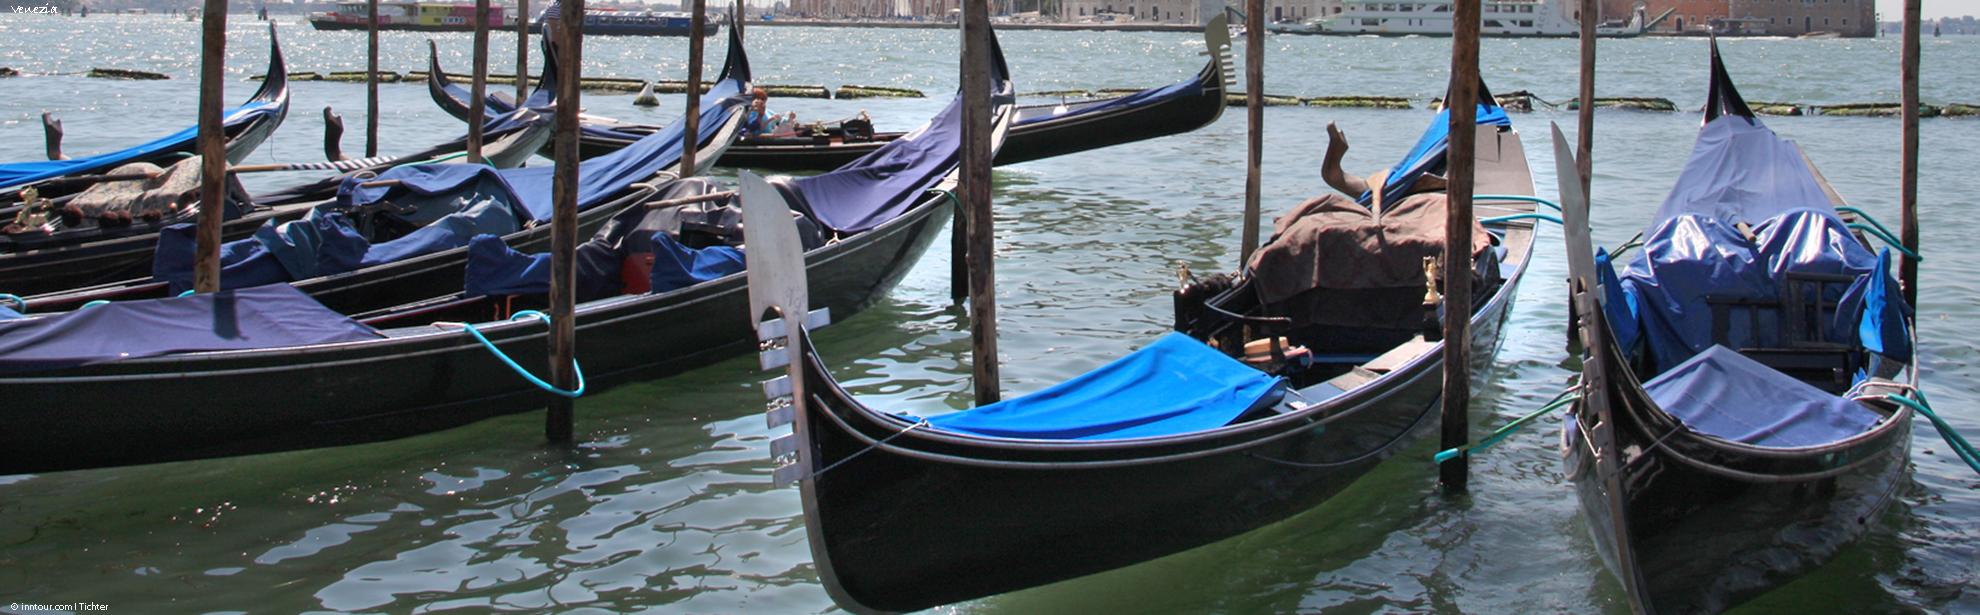 Osportinntour_Tichter_Venezia_IMG_3405